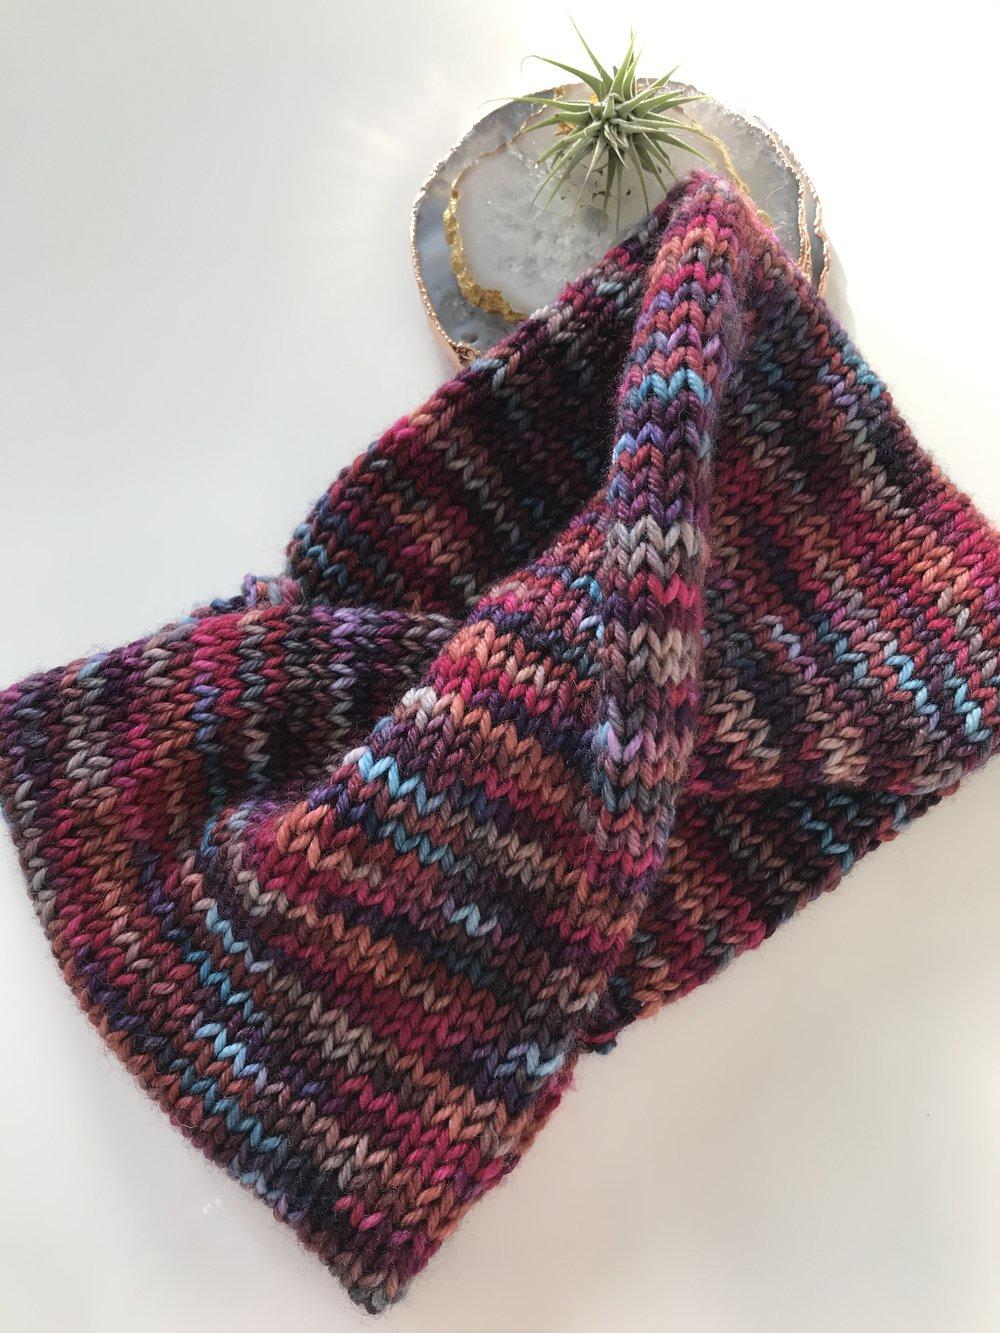 J&J Manos Alegria Knit Headband